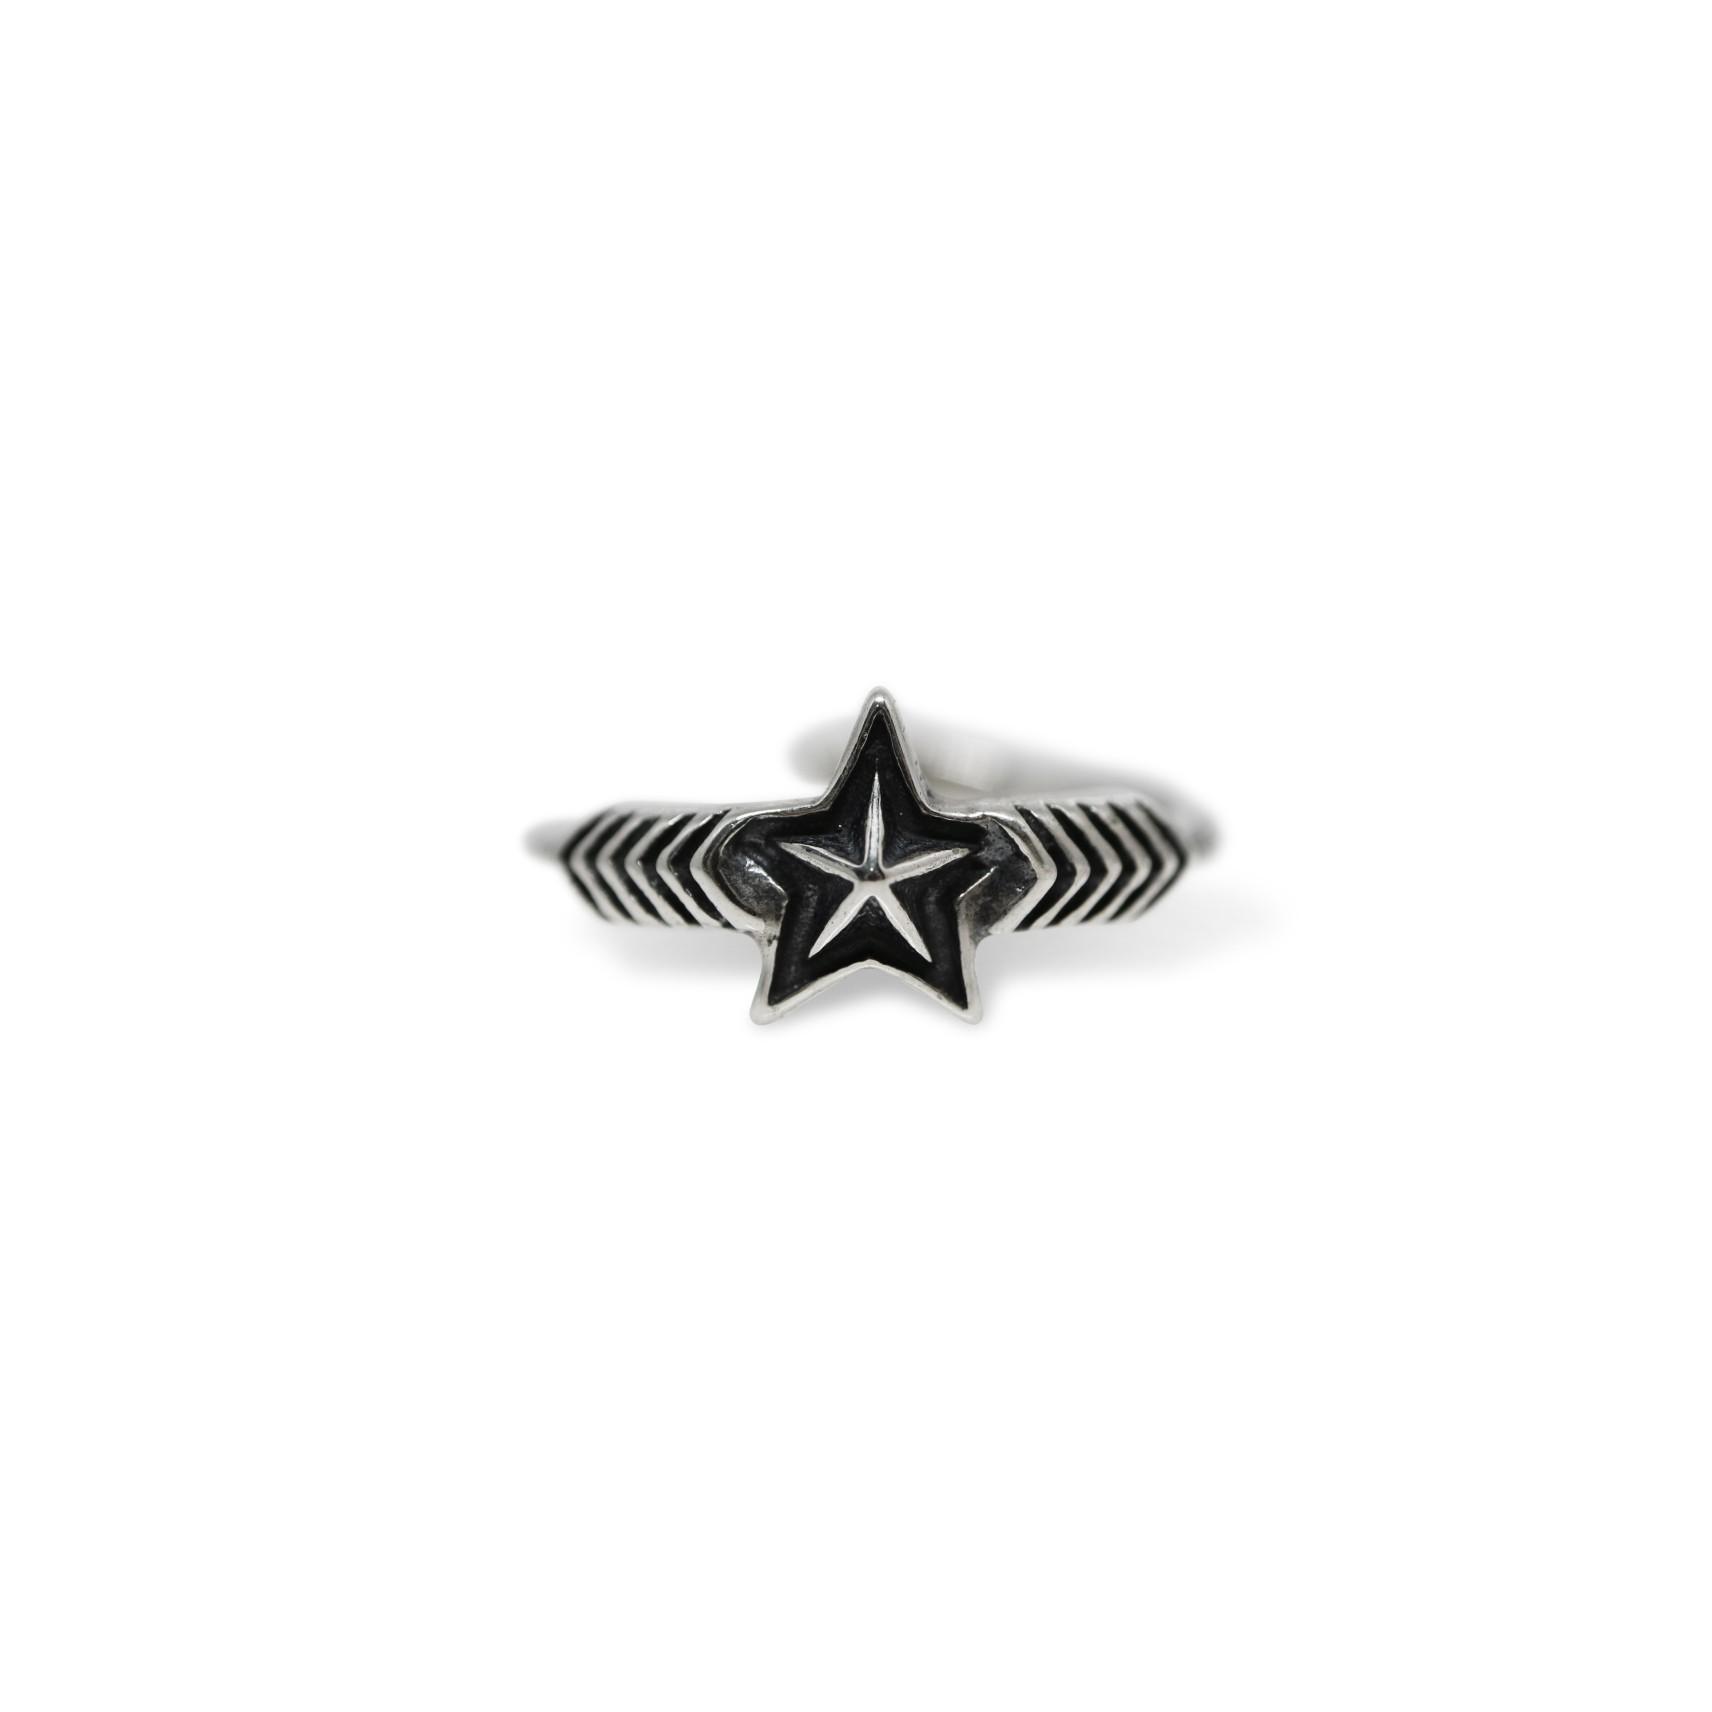 DOUBLE ARROW SMALL STAR RING [USD $430]